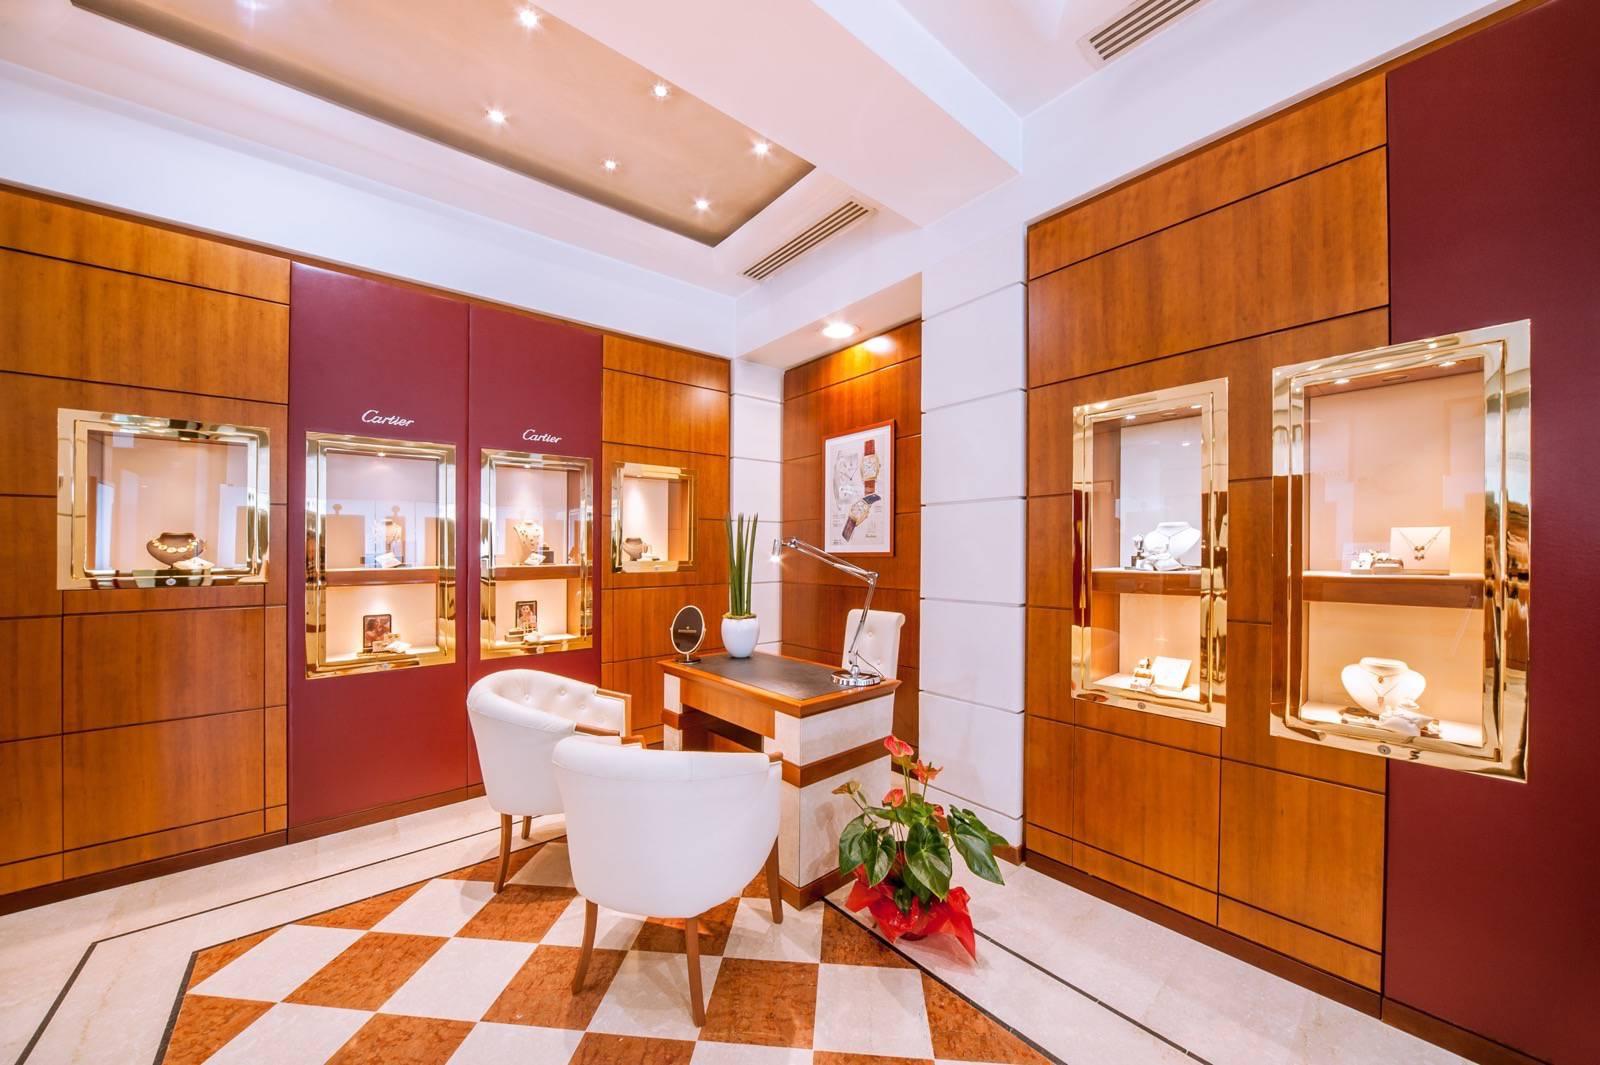 gioielli-leonardo-gioielleria-mestre-venezia-10